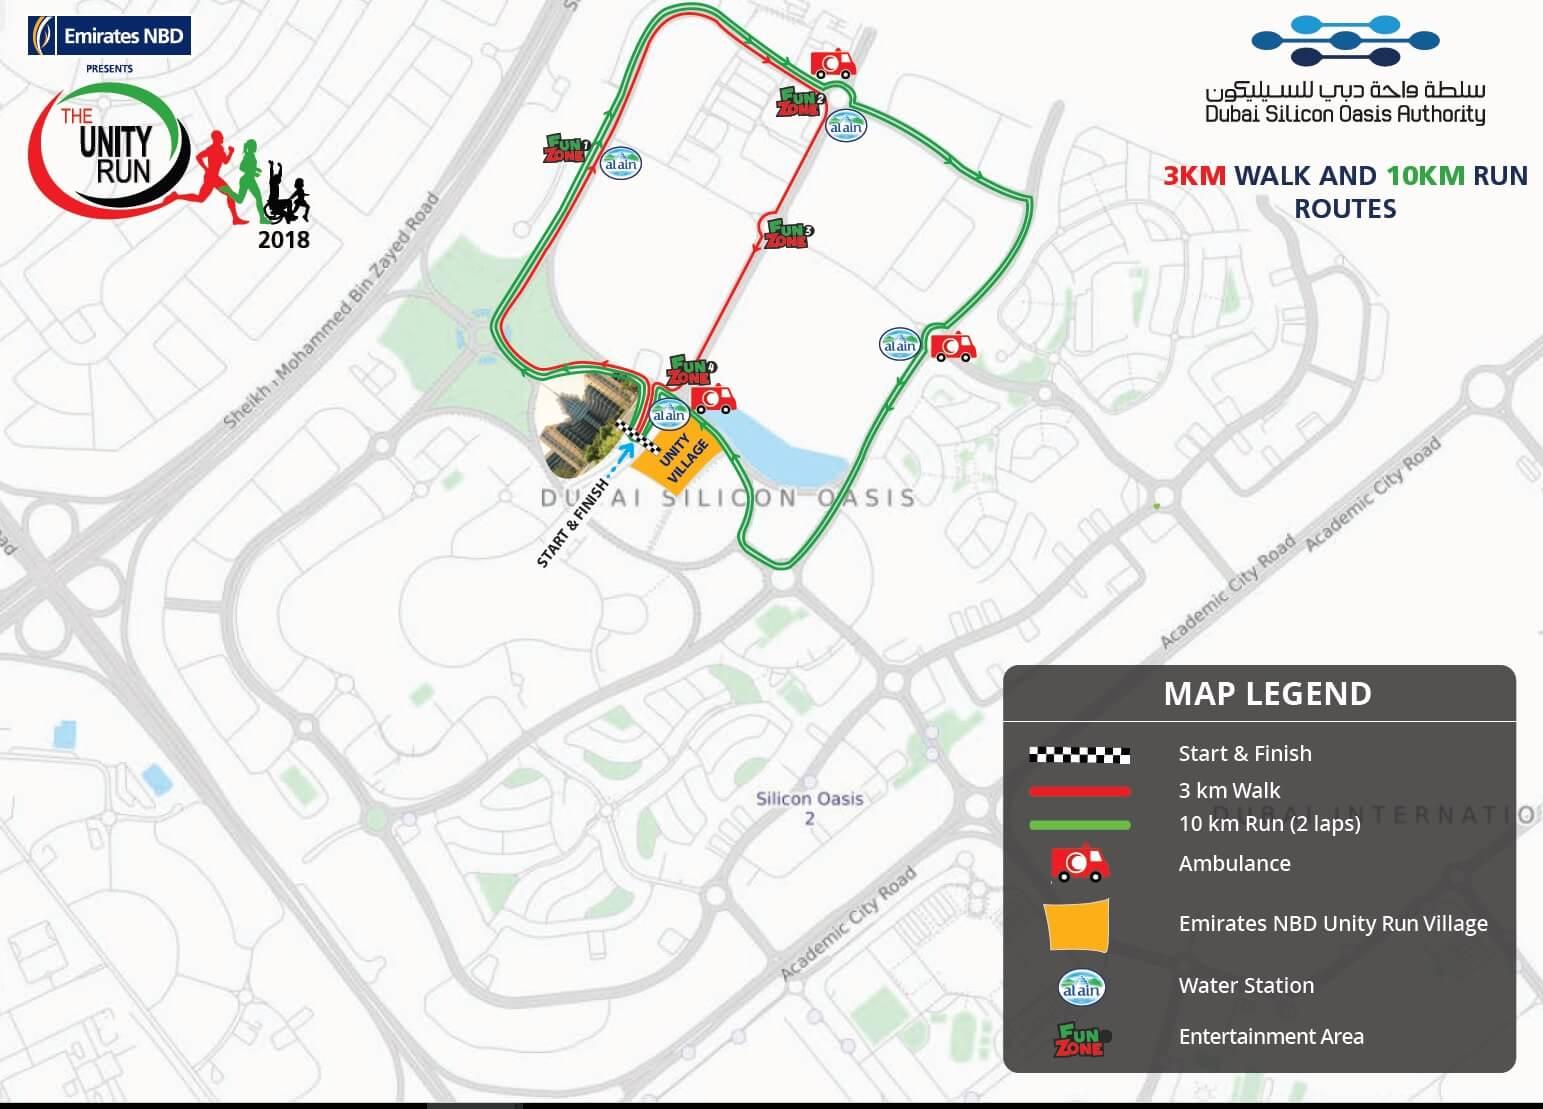 Emirates NBD Unity Run Map